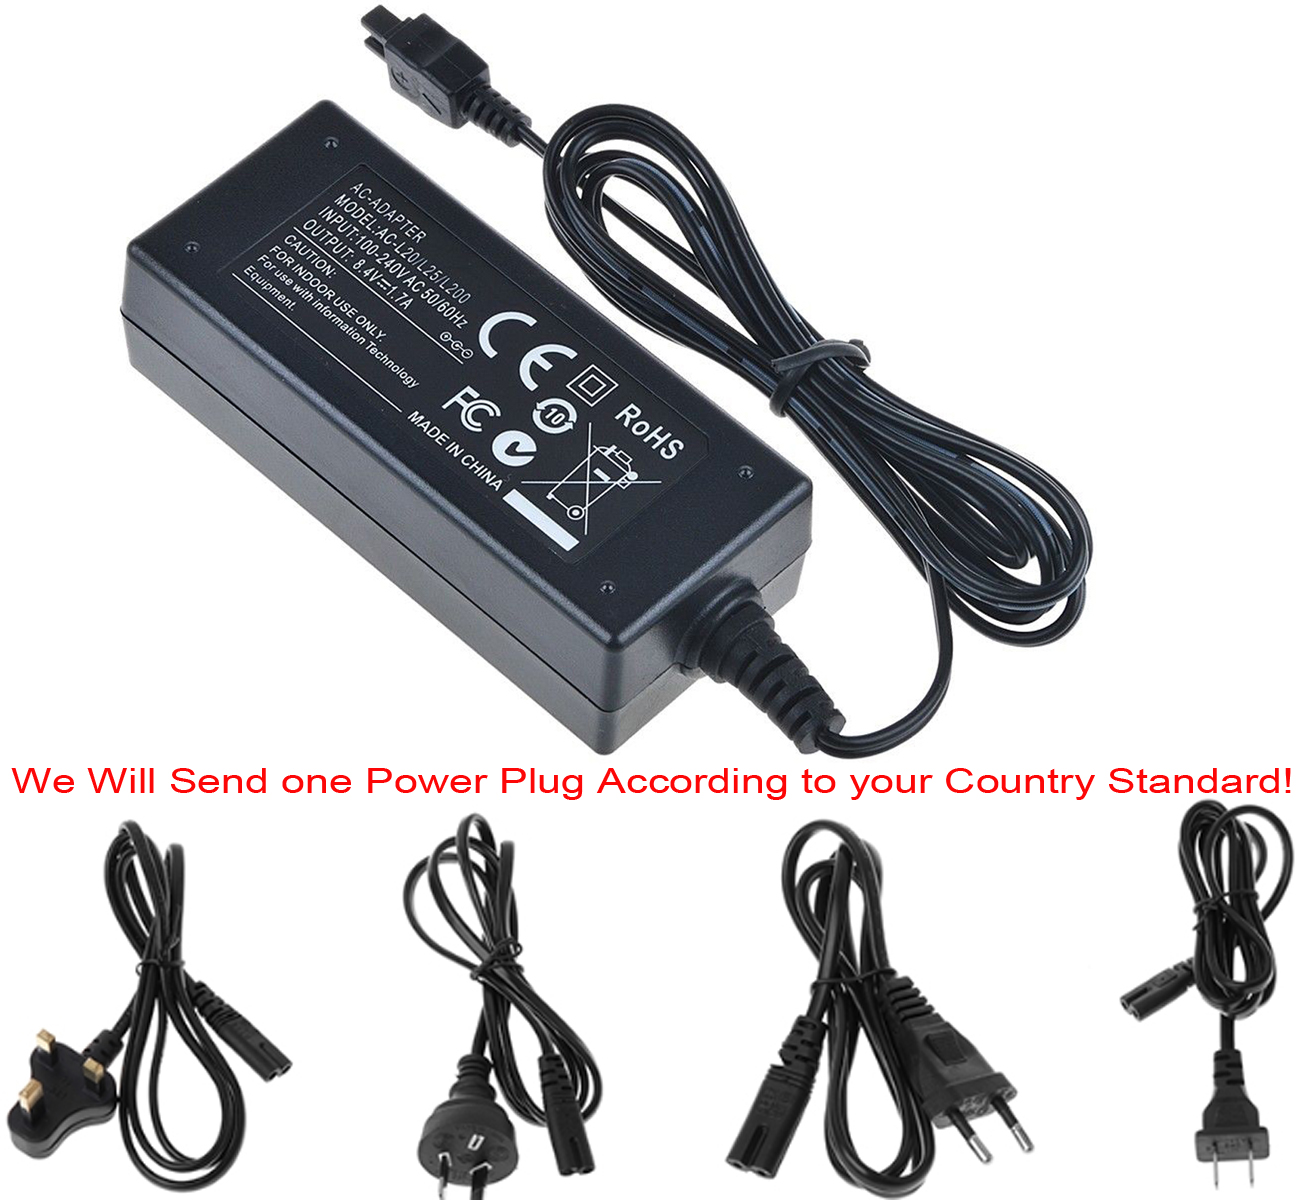 AC Power Supply for Sony AC-L25A DCR-HC19E DCR-HC28 DCR-HC24E DCR-HC38 DCR-DVD92